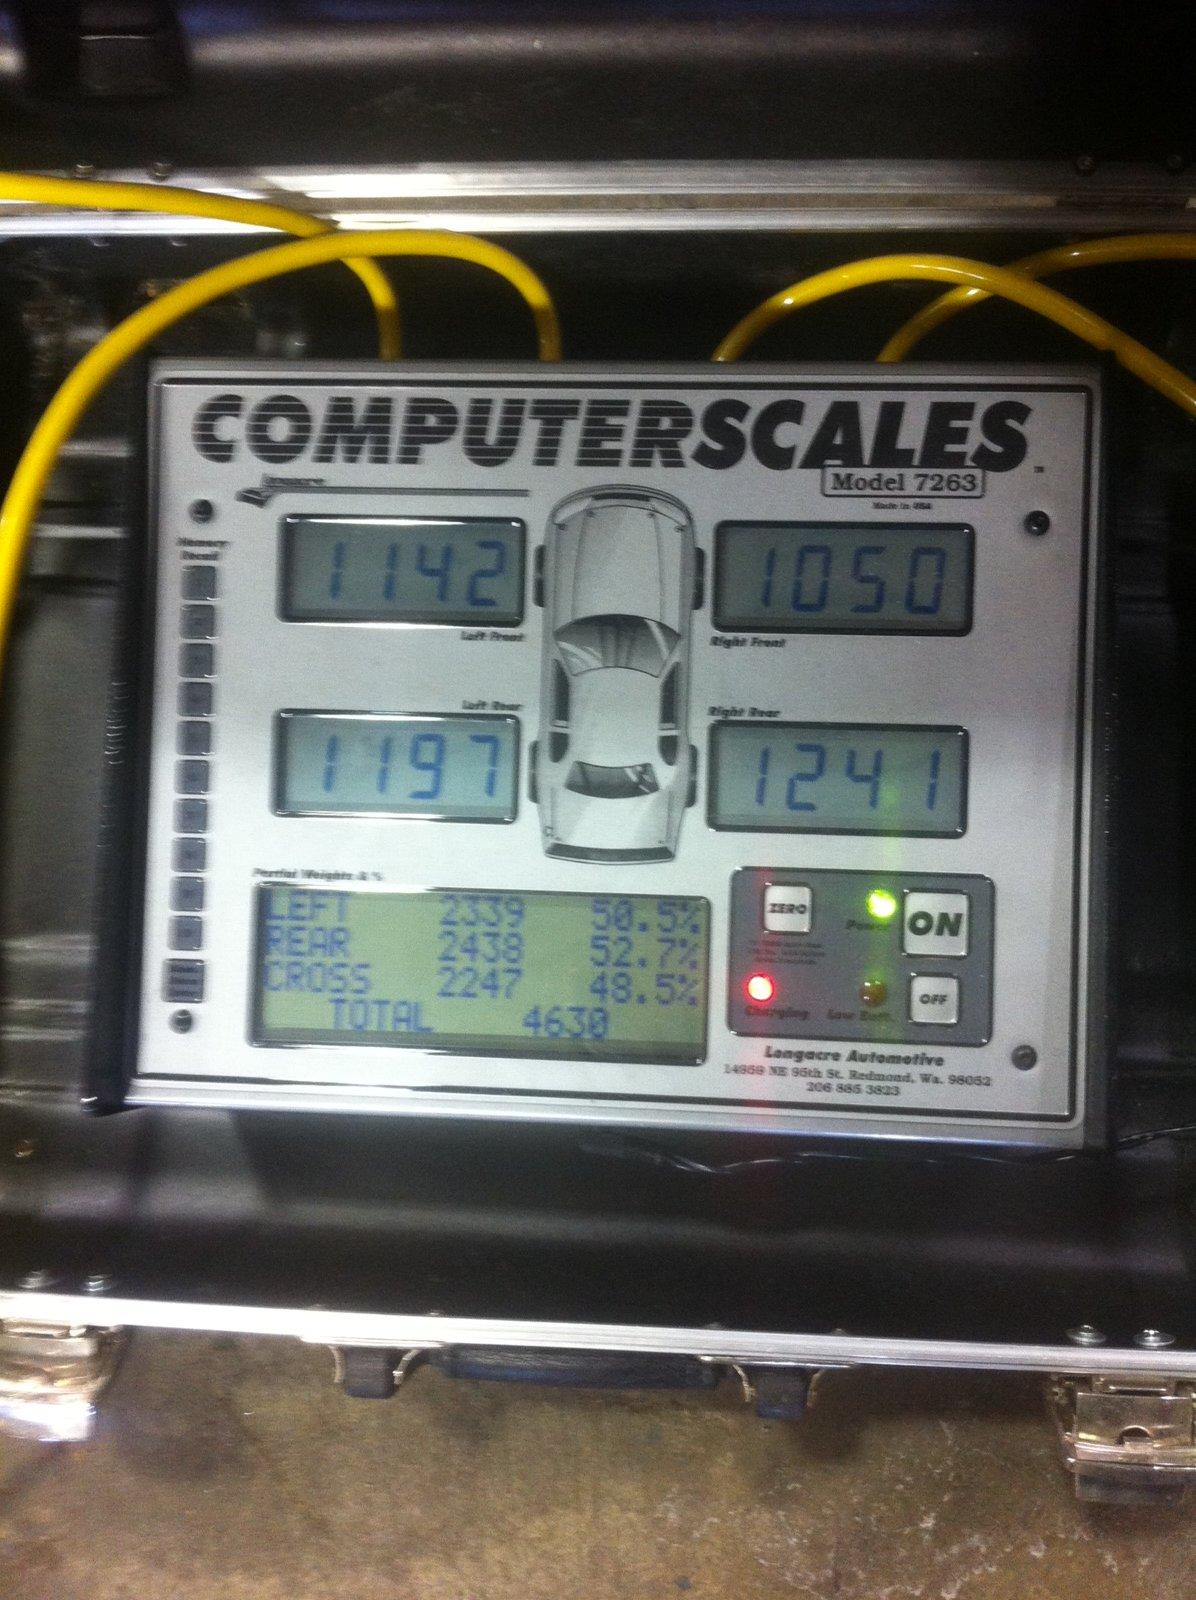 weight-scales-HStuning-jan27-2015.jpeg